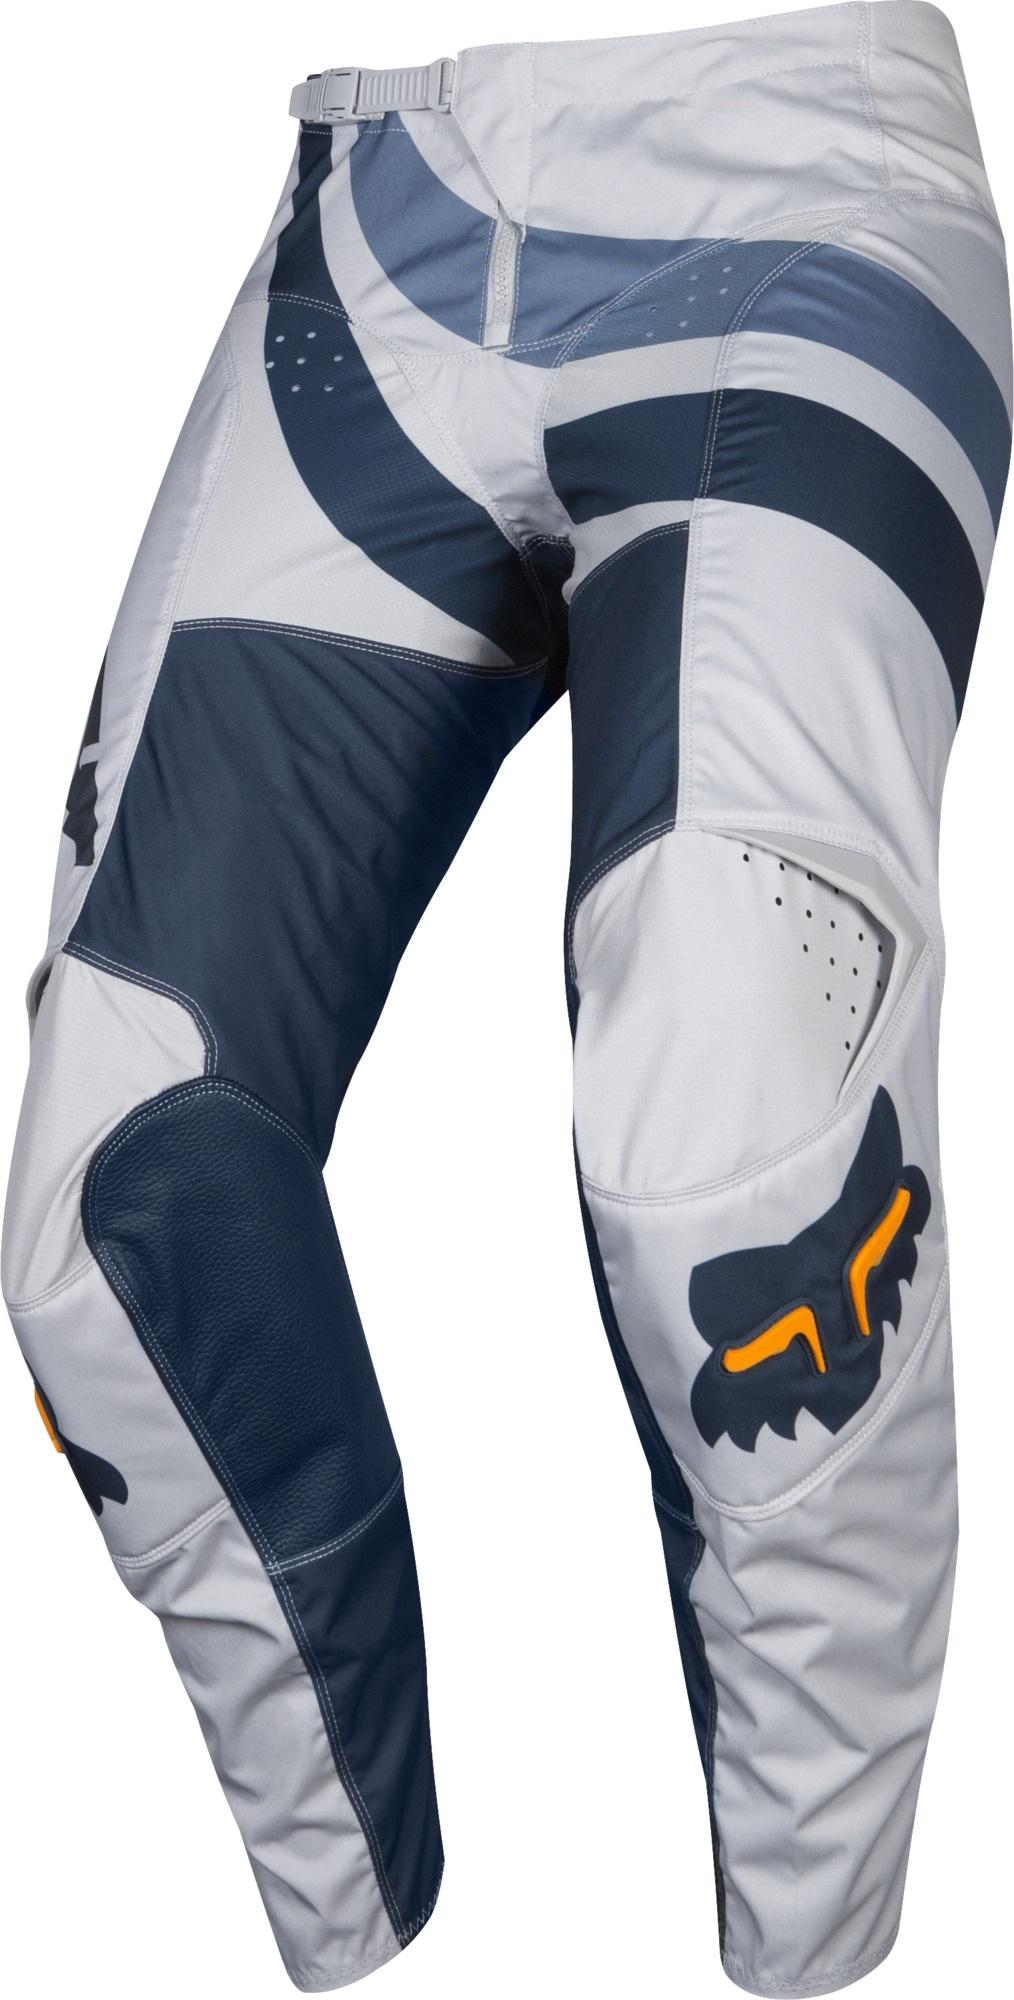 FOX 180 Cota Pant, Grey/Navy MX19